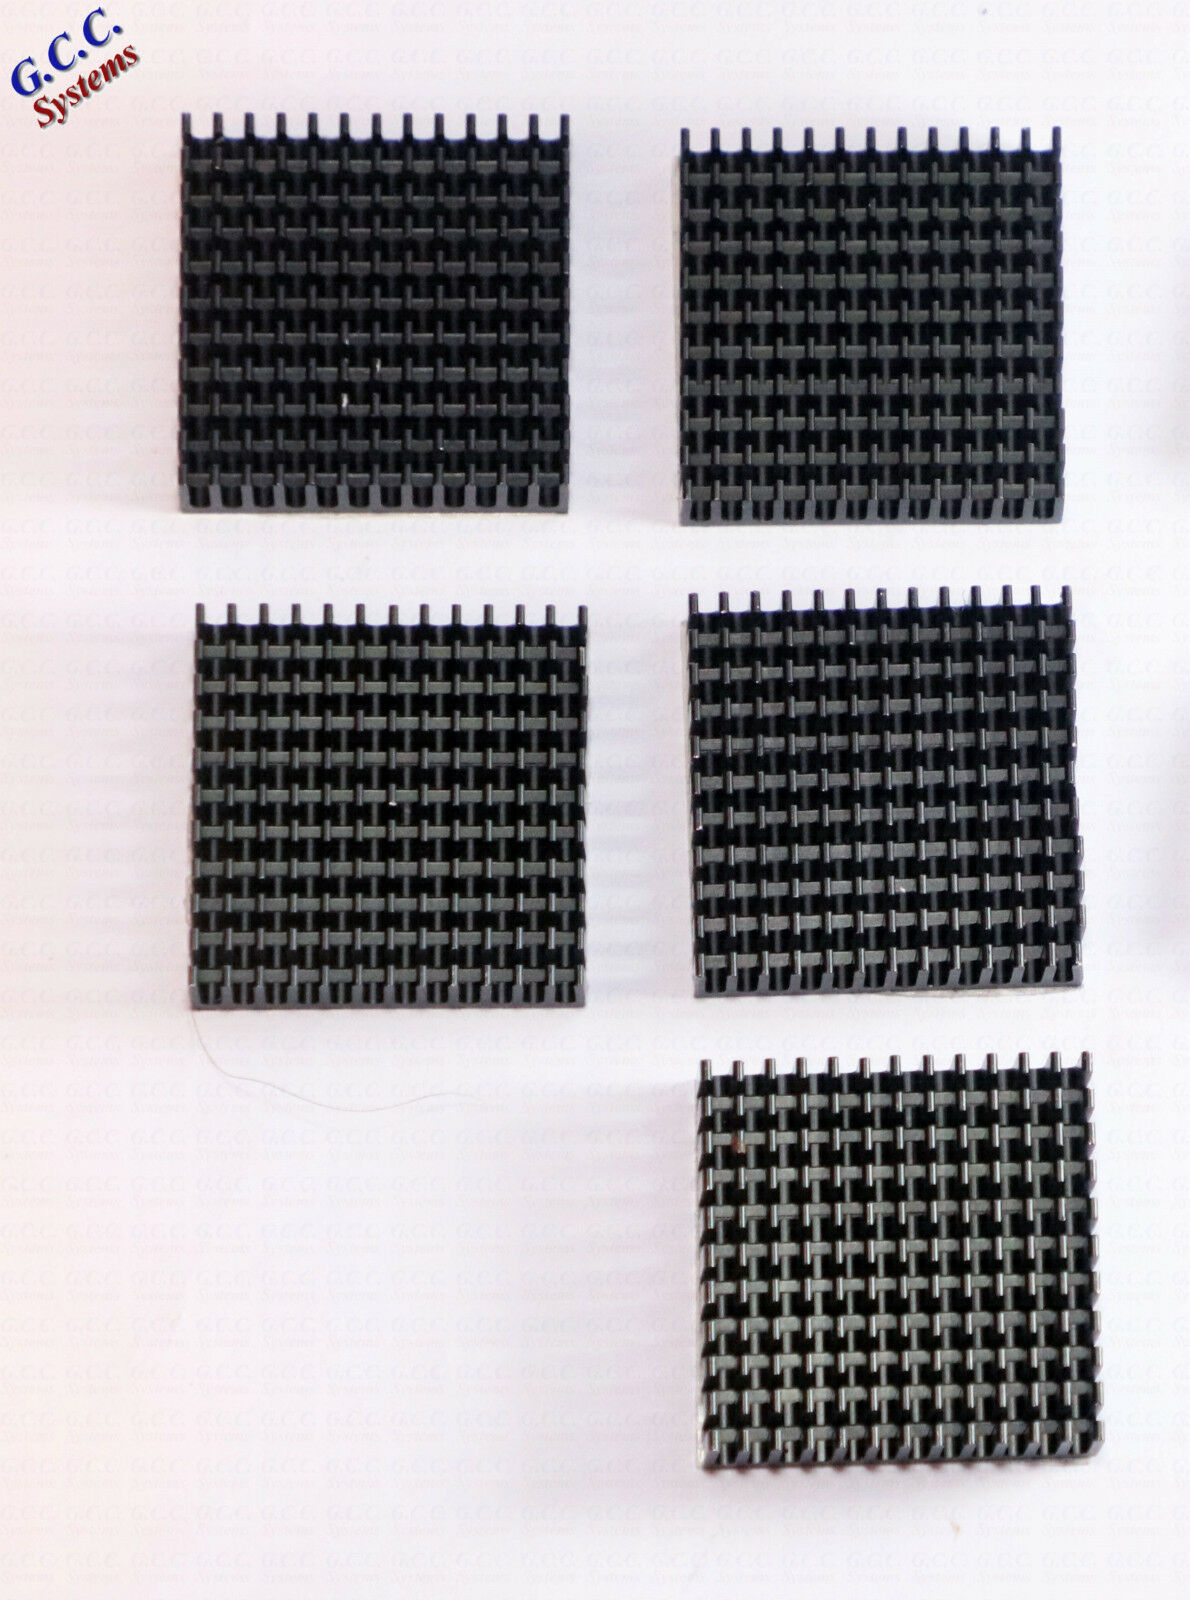 5x 3D Printer NEMA17 42 Stepper Motor Heatsinks With Adhesive Backing